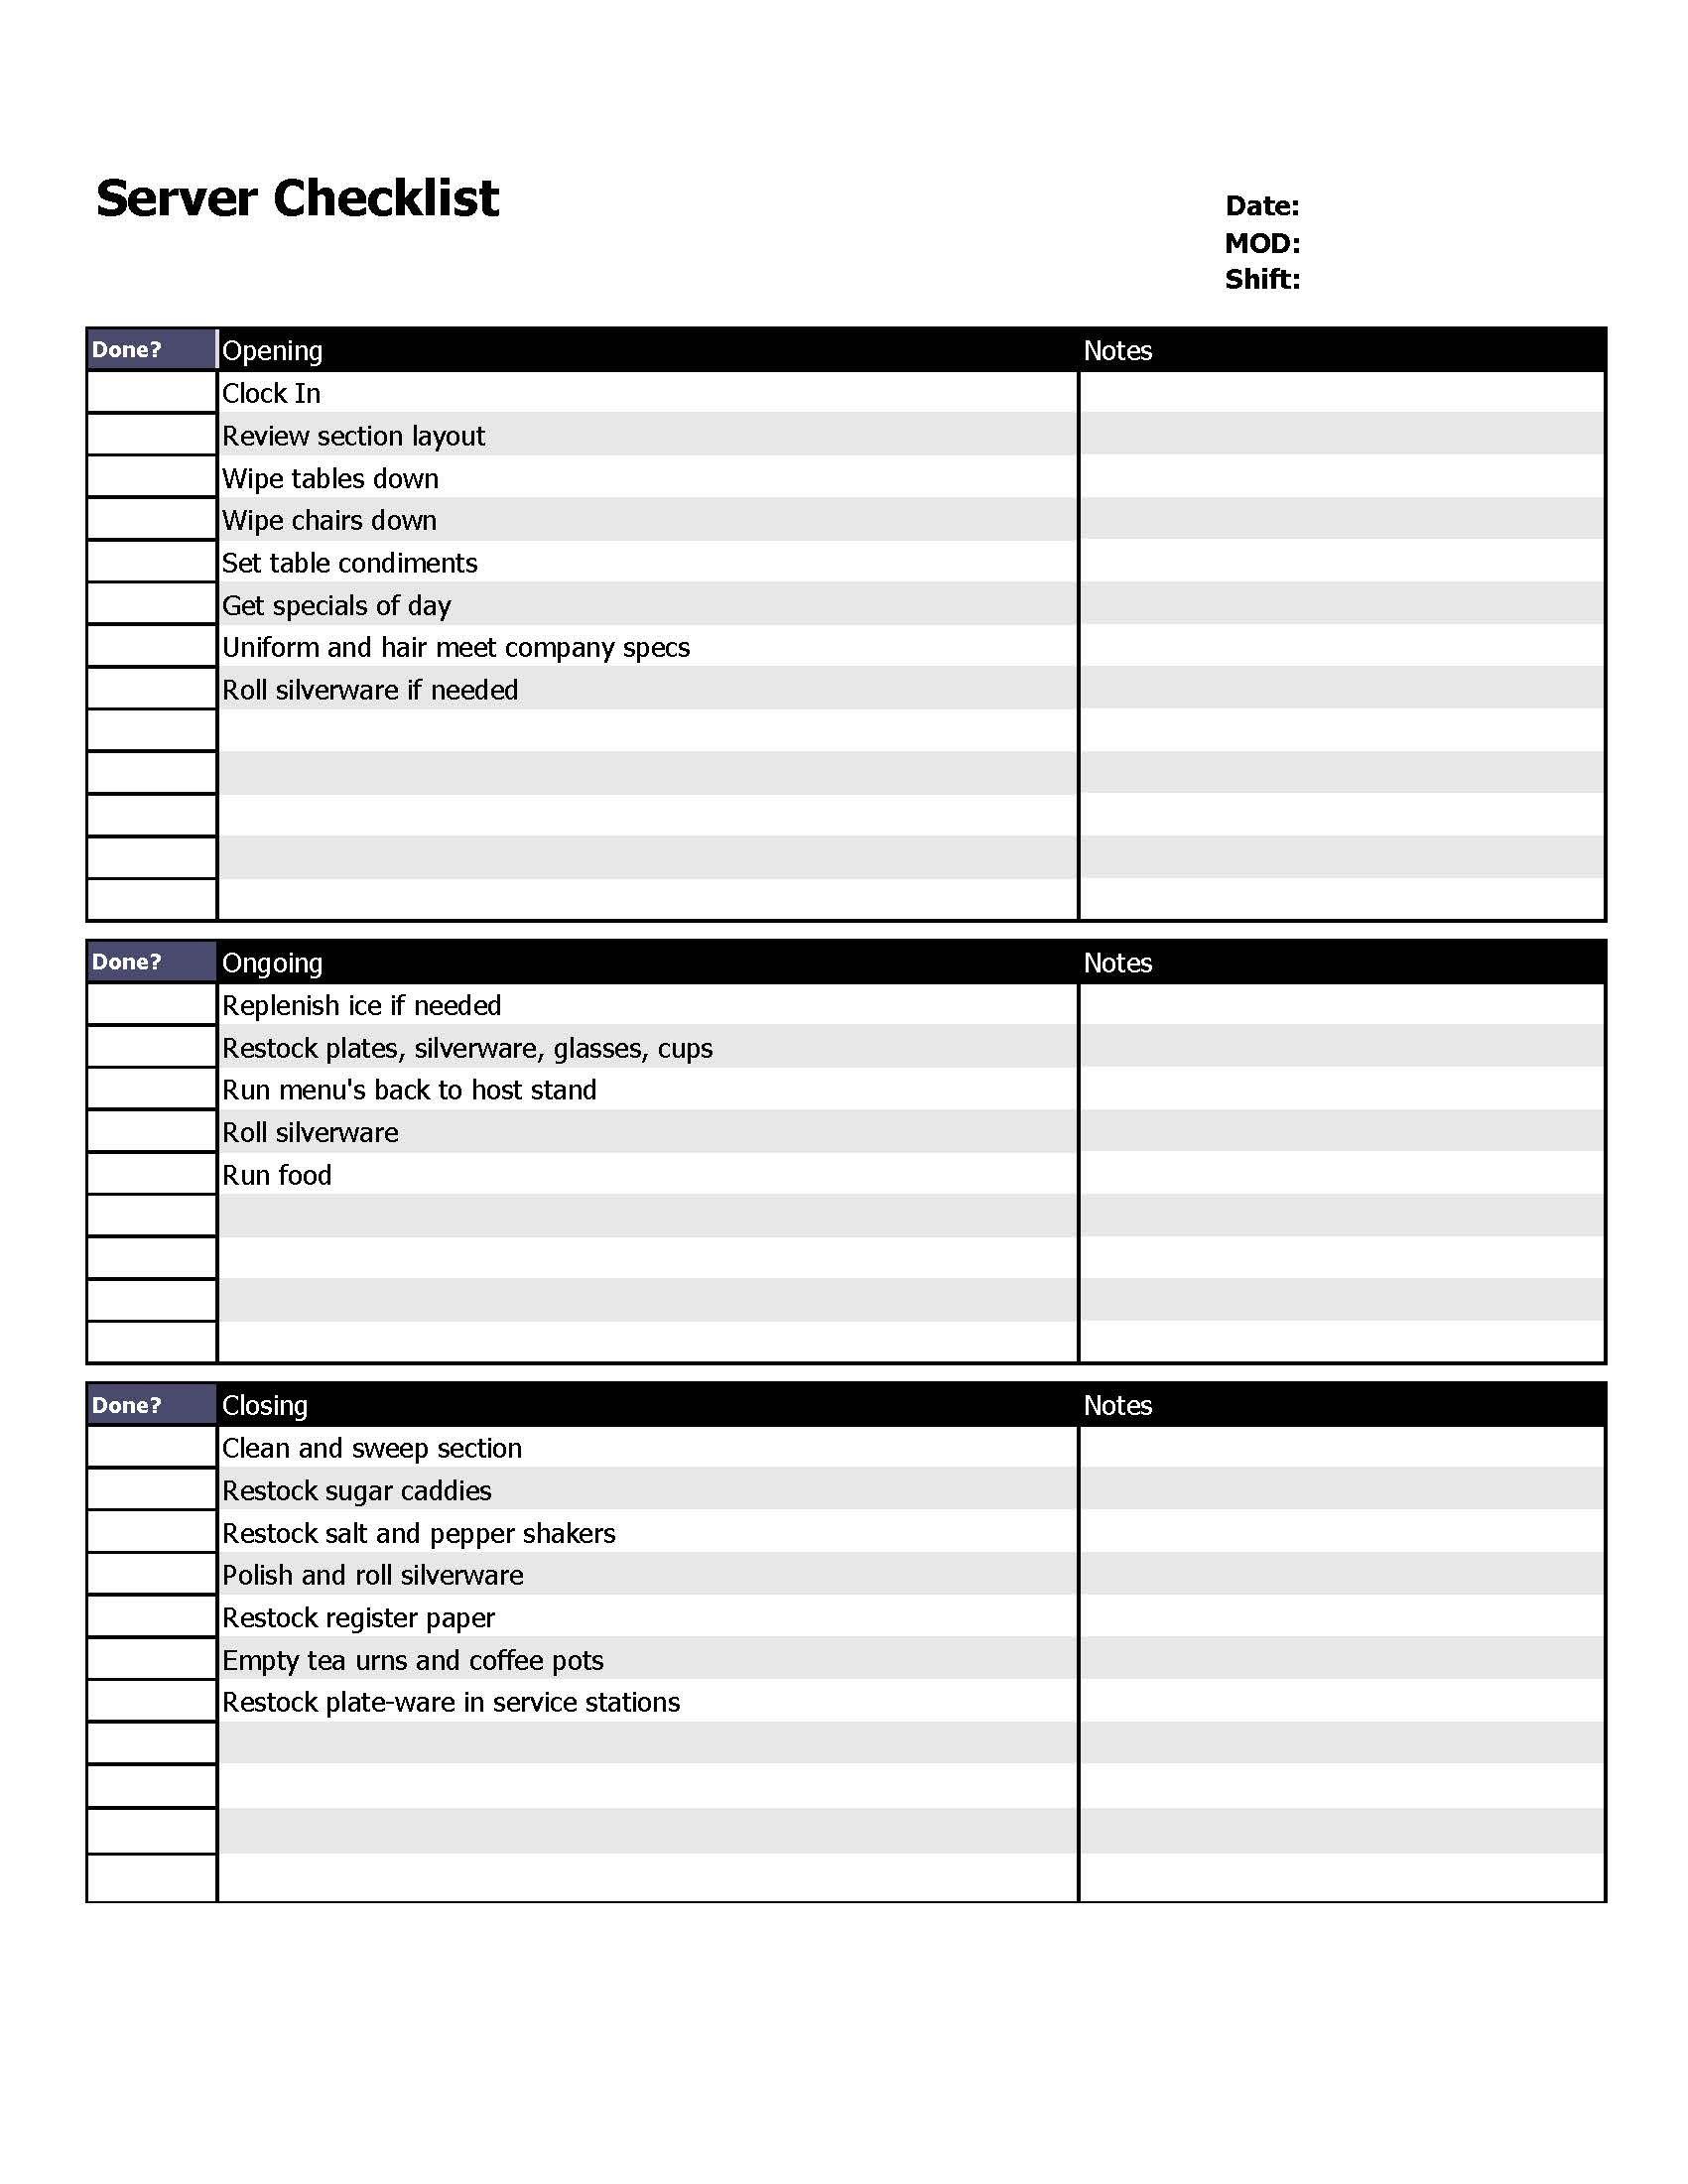 Restaurant Server Checklist Form